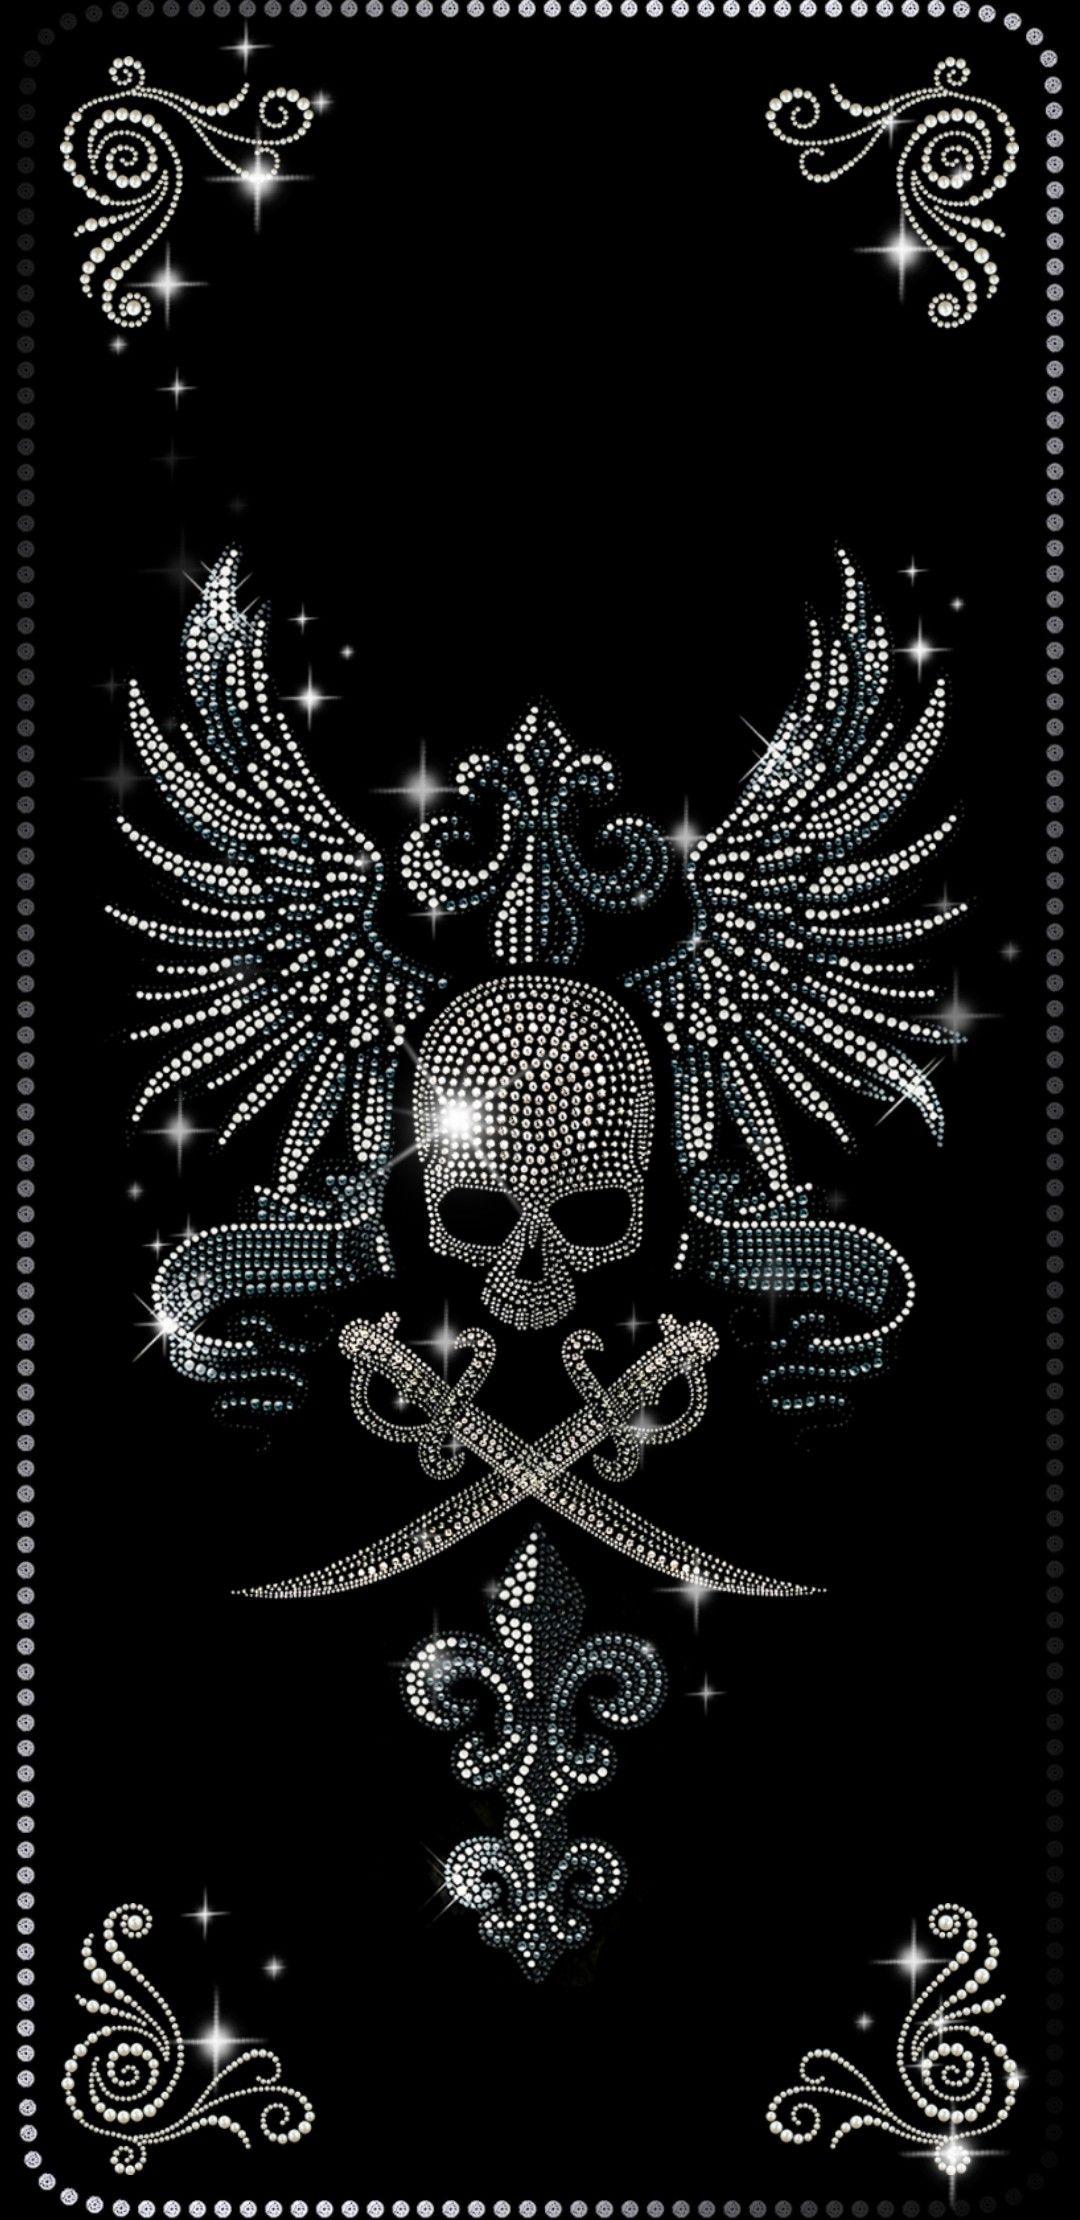 Phone case Skull wallpaper, Skull wallpaper iphone